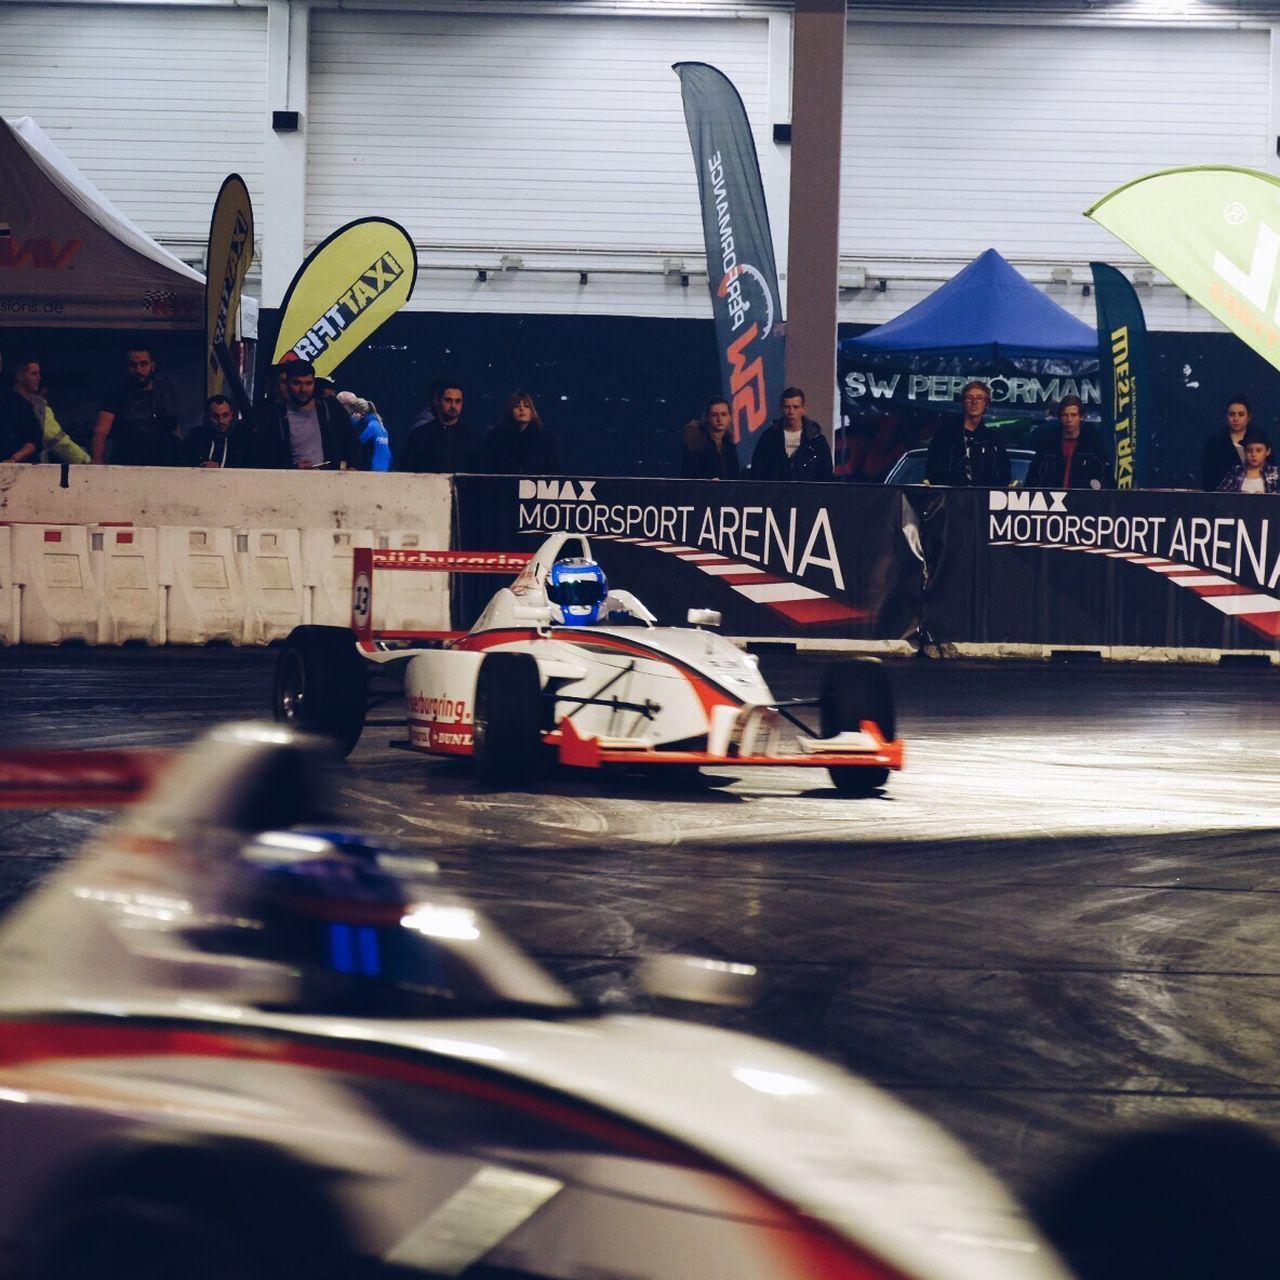 Car Motion Drifting Car Show Racetrack